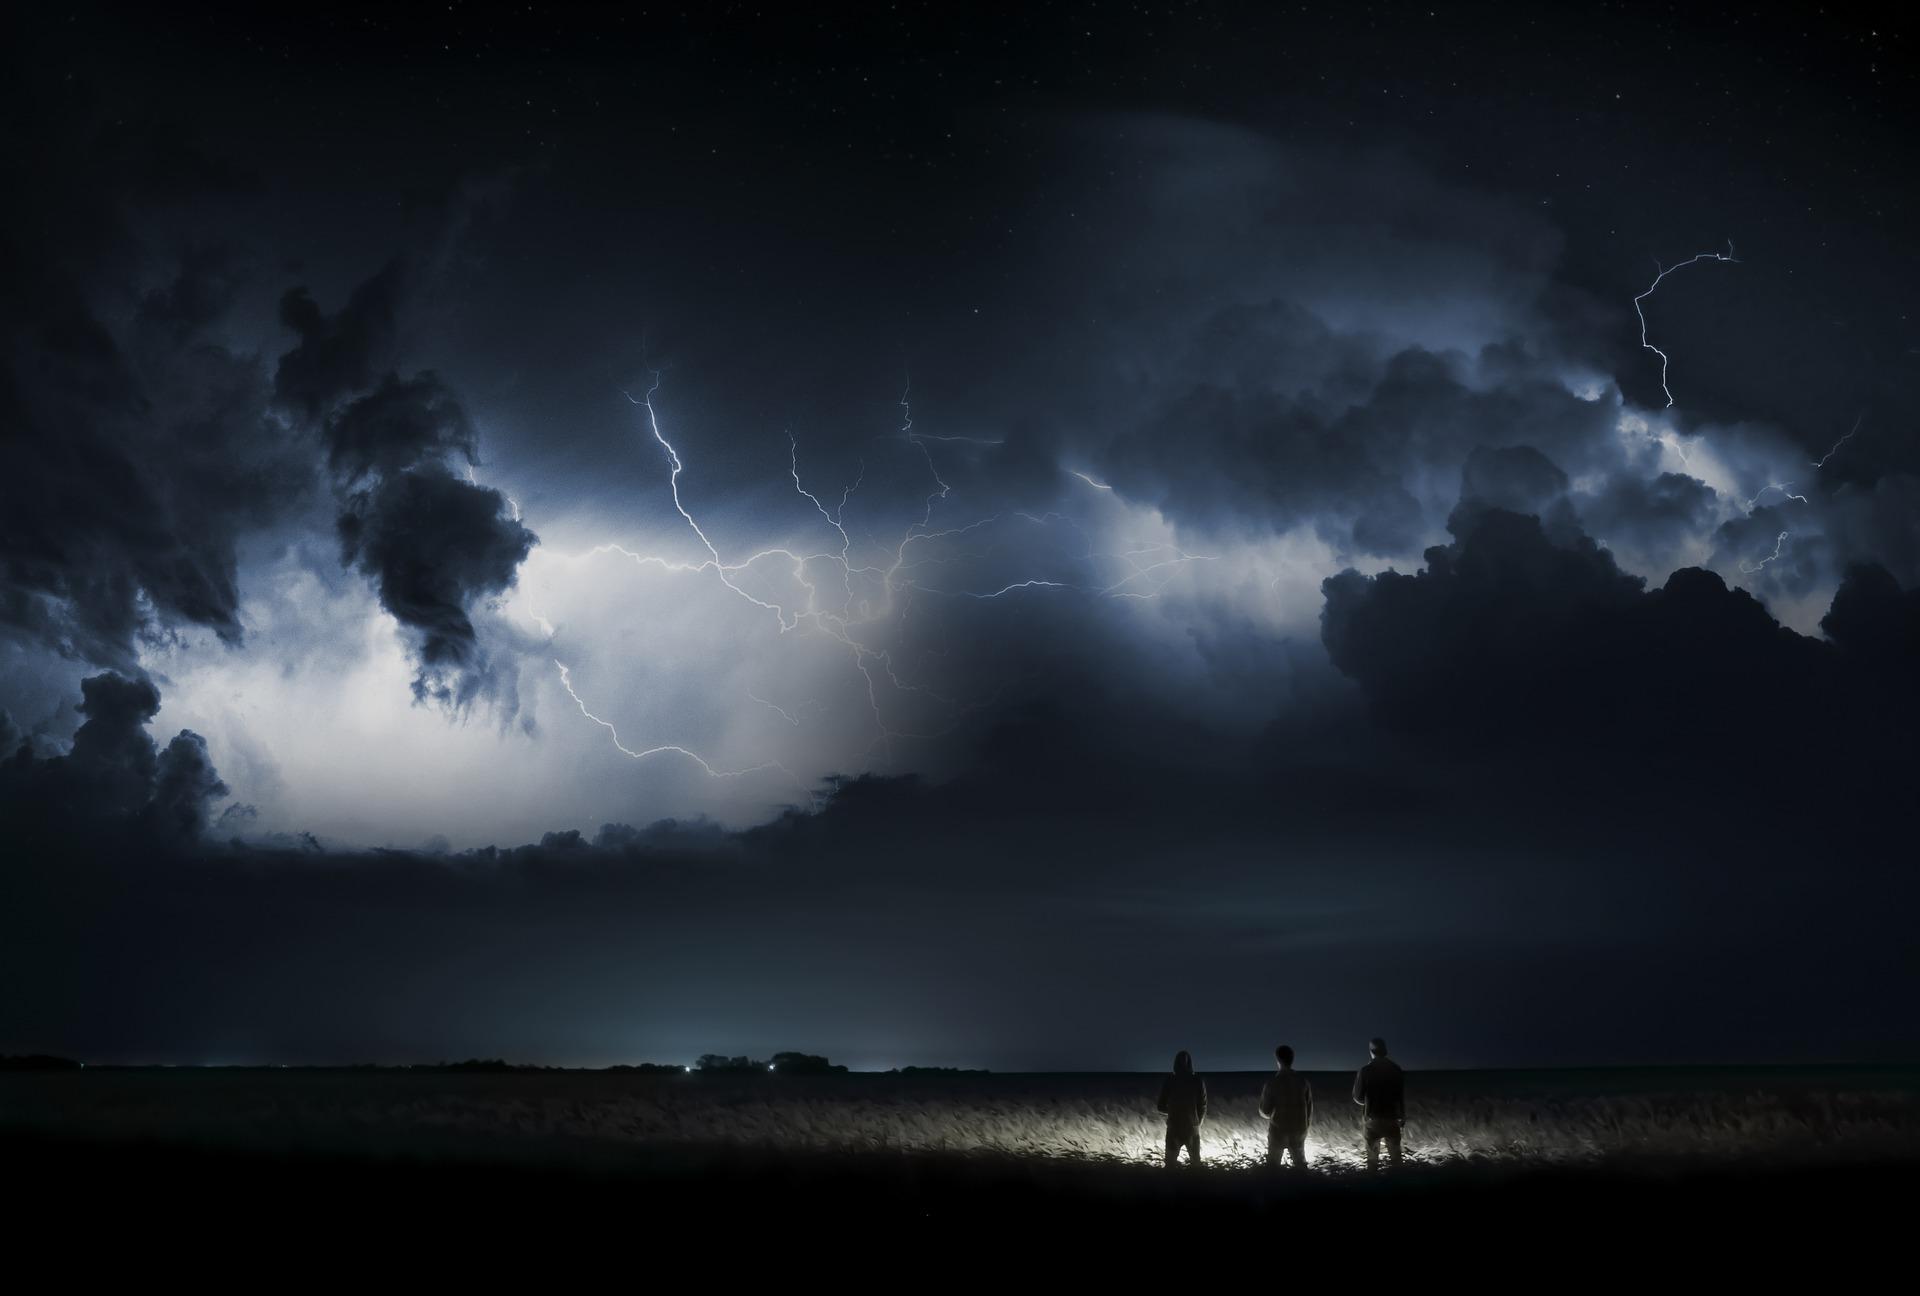 storm-3041241_1920 copy.jpg